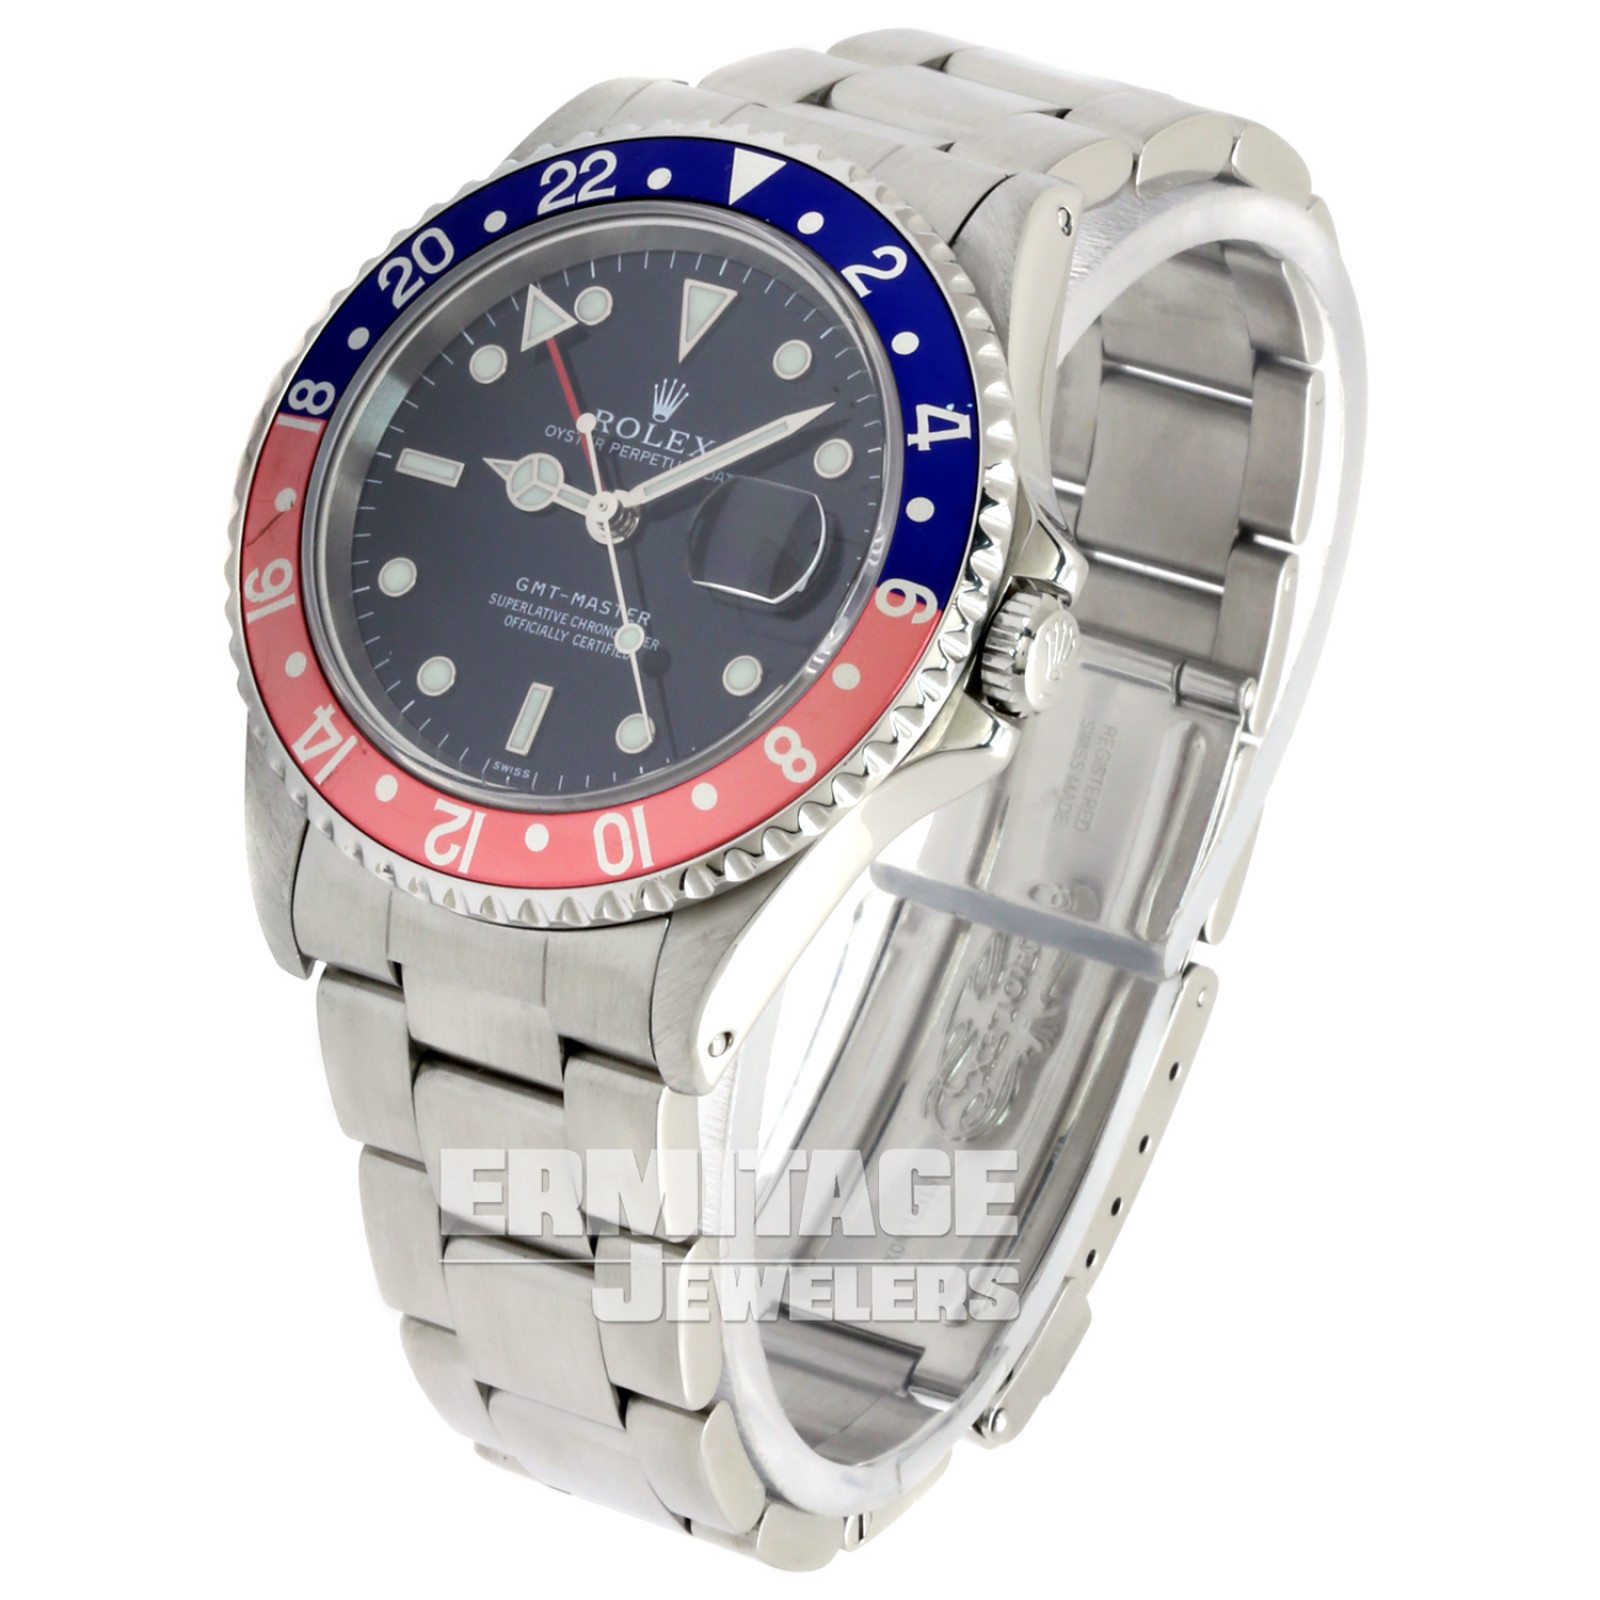 1998   Rolex GMT-Master II Ref. 16700 Mint Condition Single